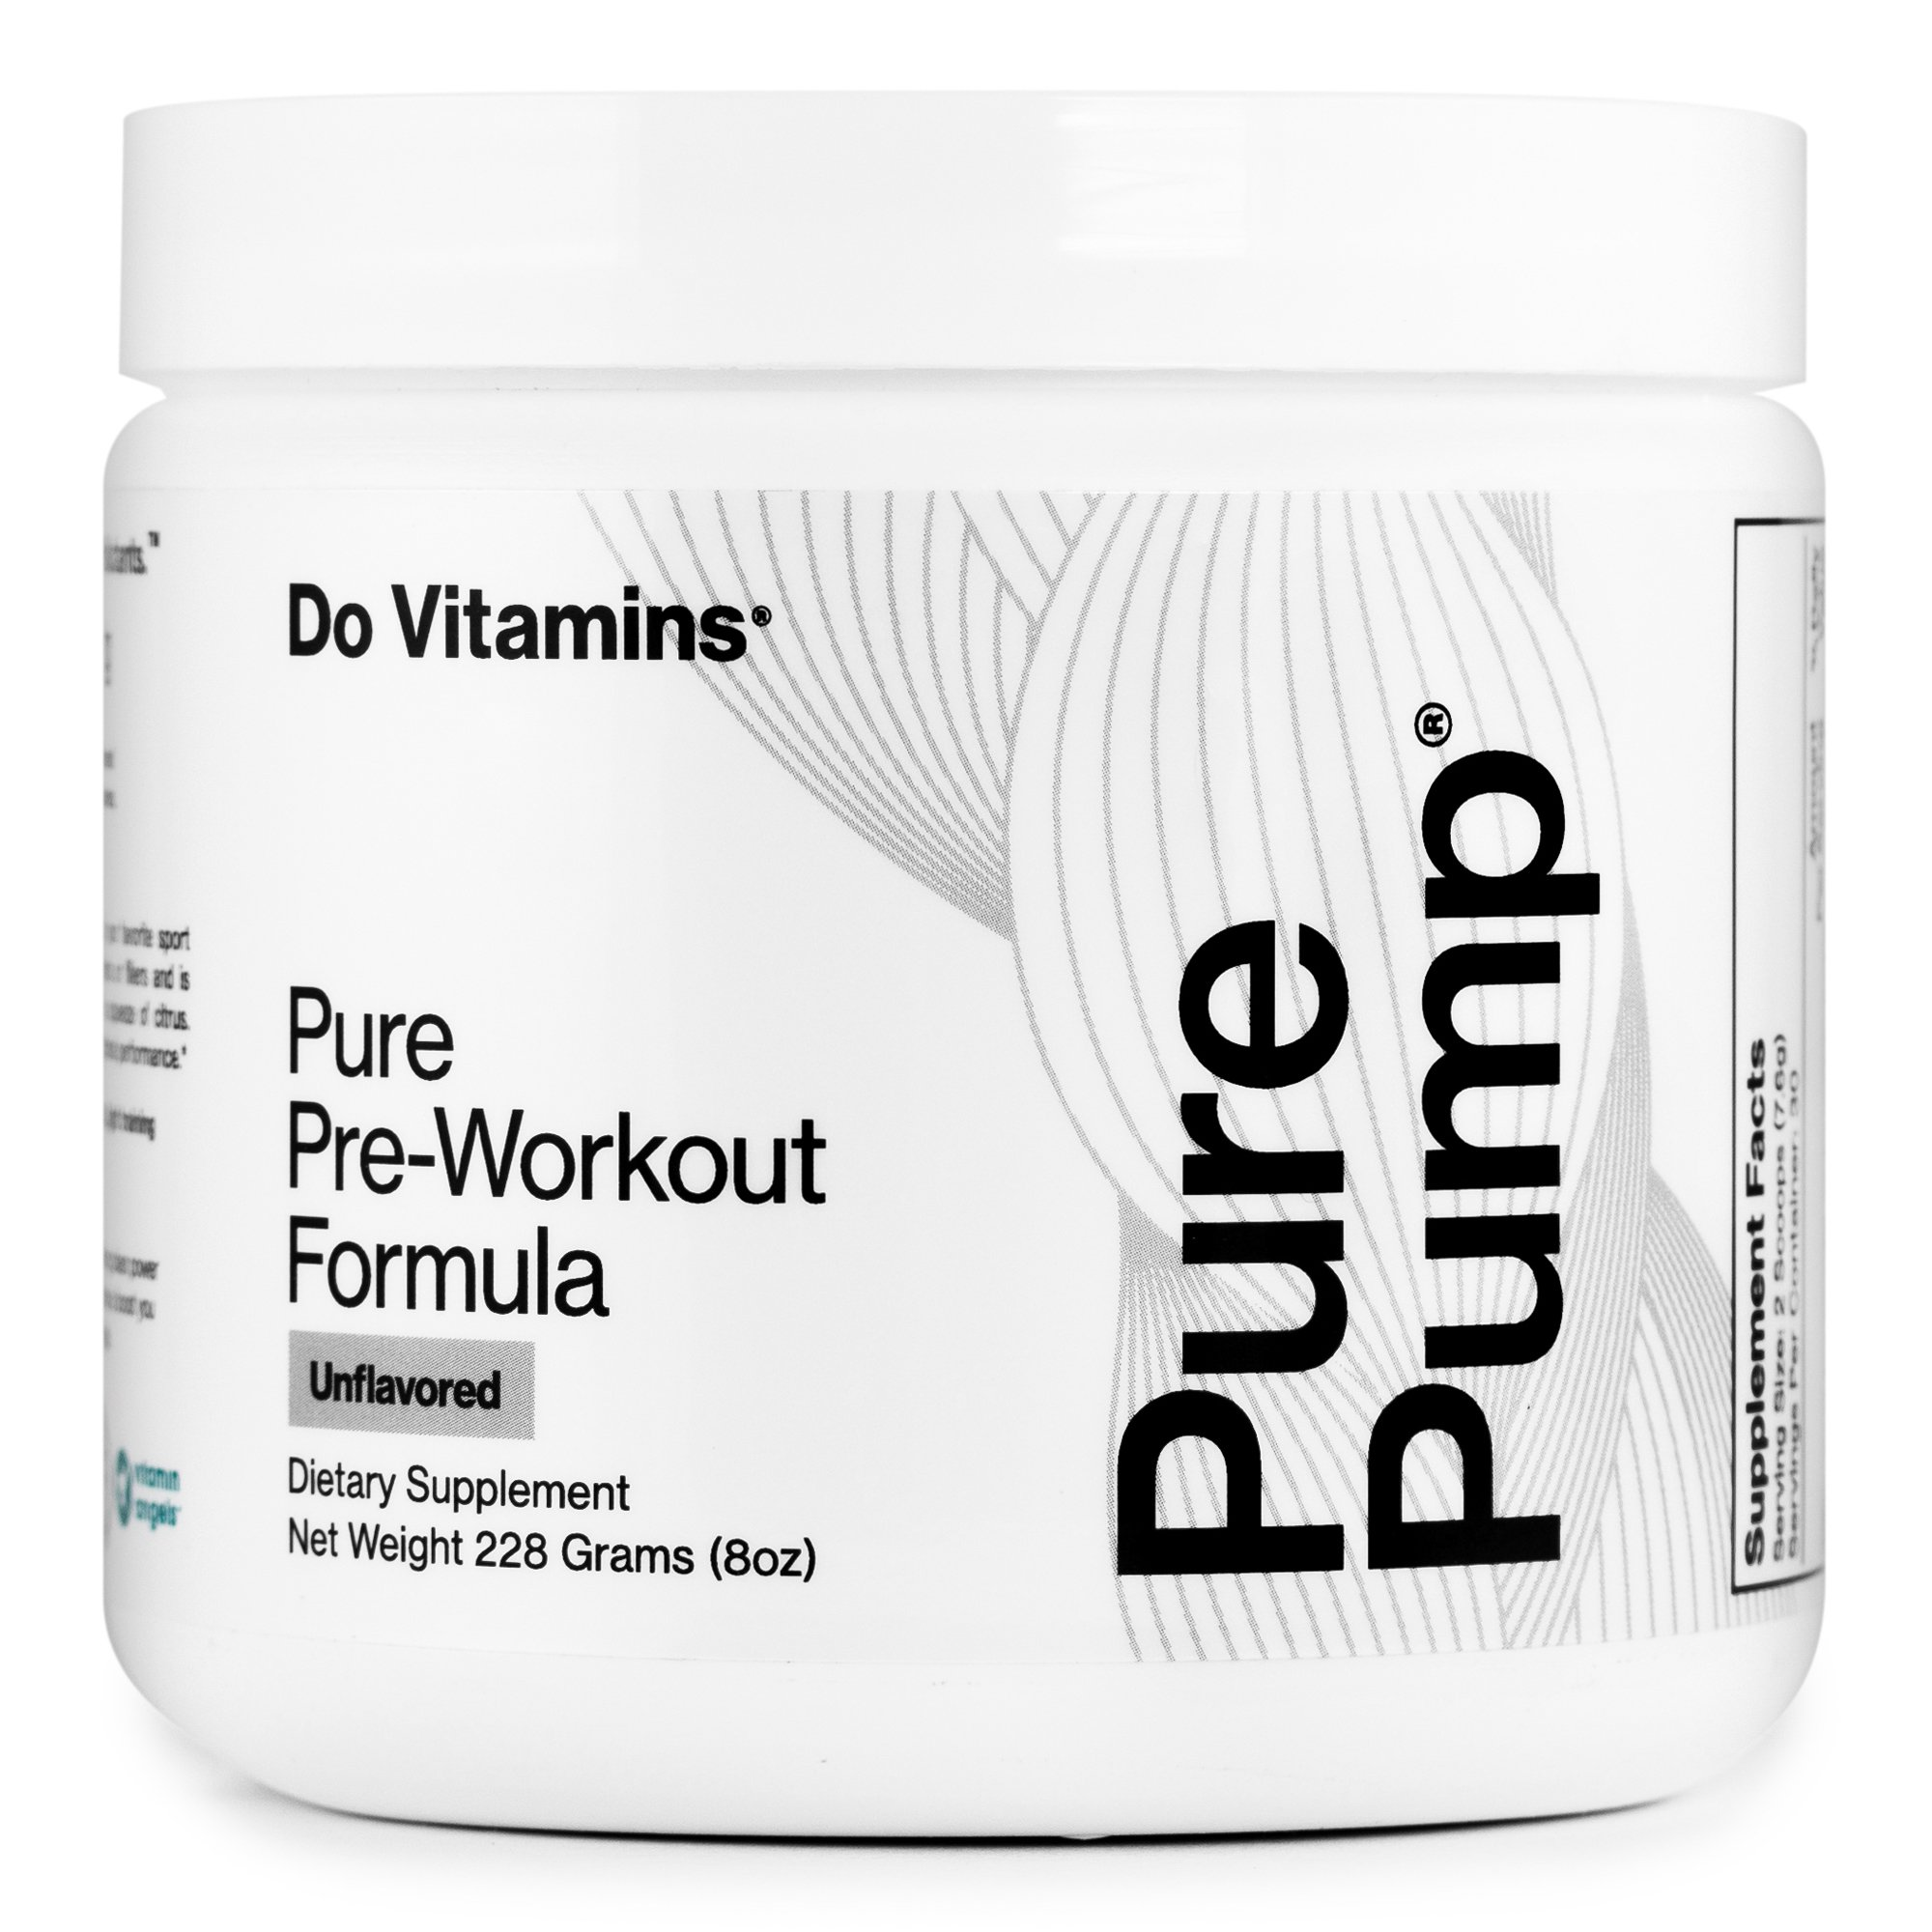 PurePump Unflavored - Do Vitamins - Certified Paleo, Keto Certified, Paleo Friendly, PaleoVegan by the Paleo Foundation